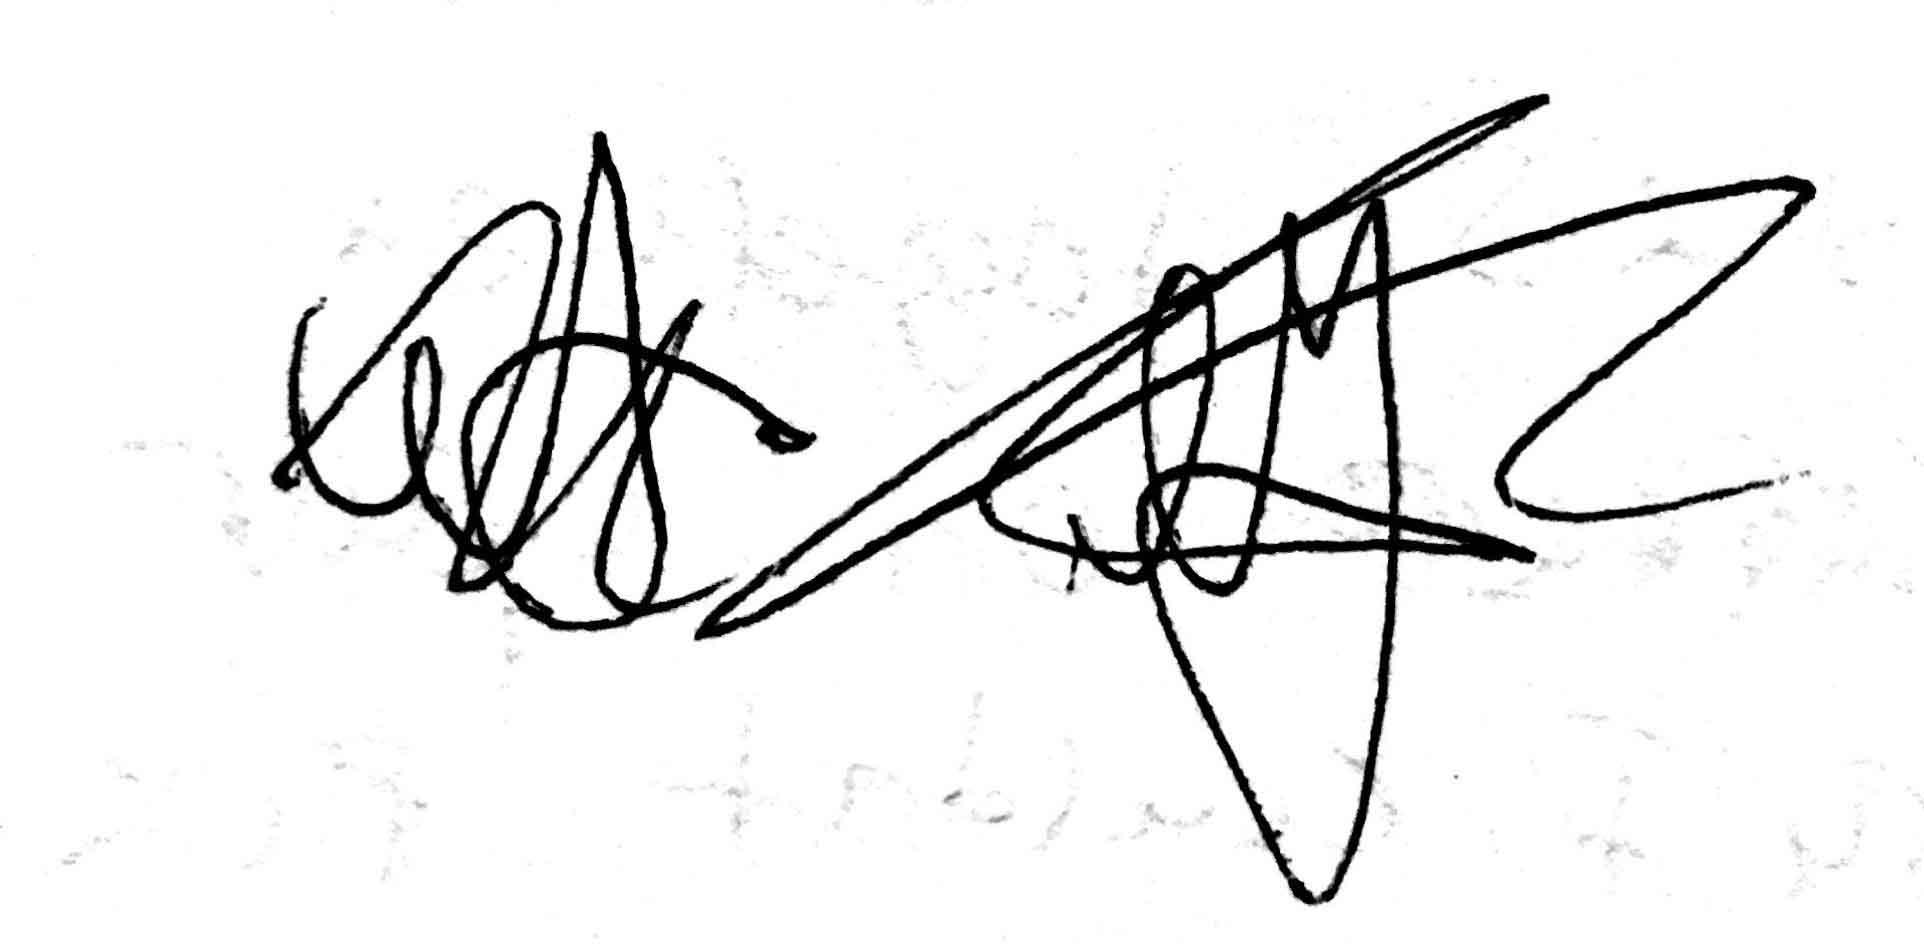 TONI-GORDON-TENNANT-SIGNATURE.jpg